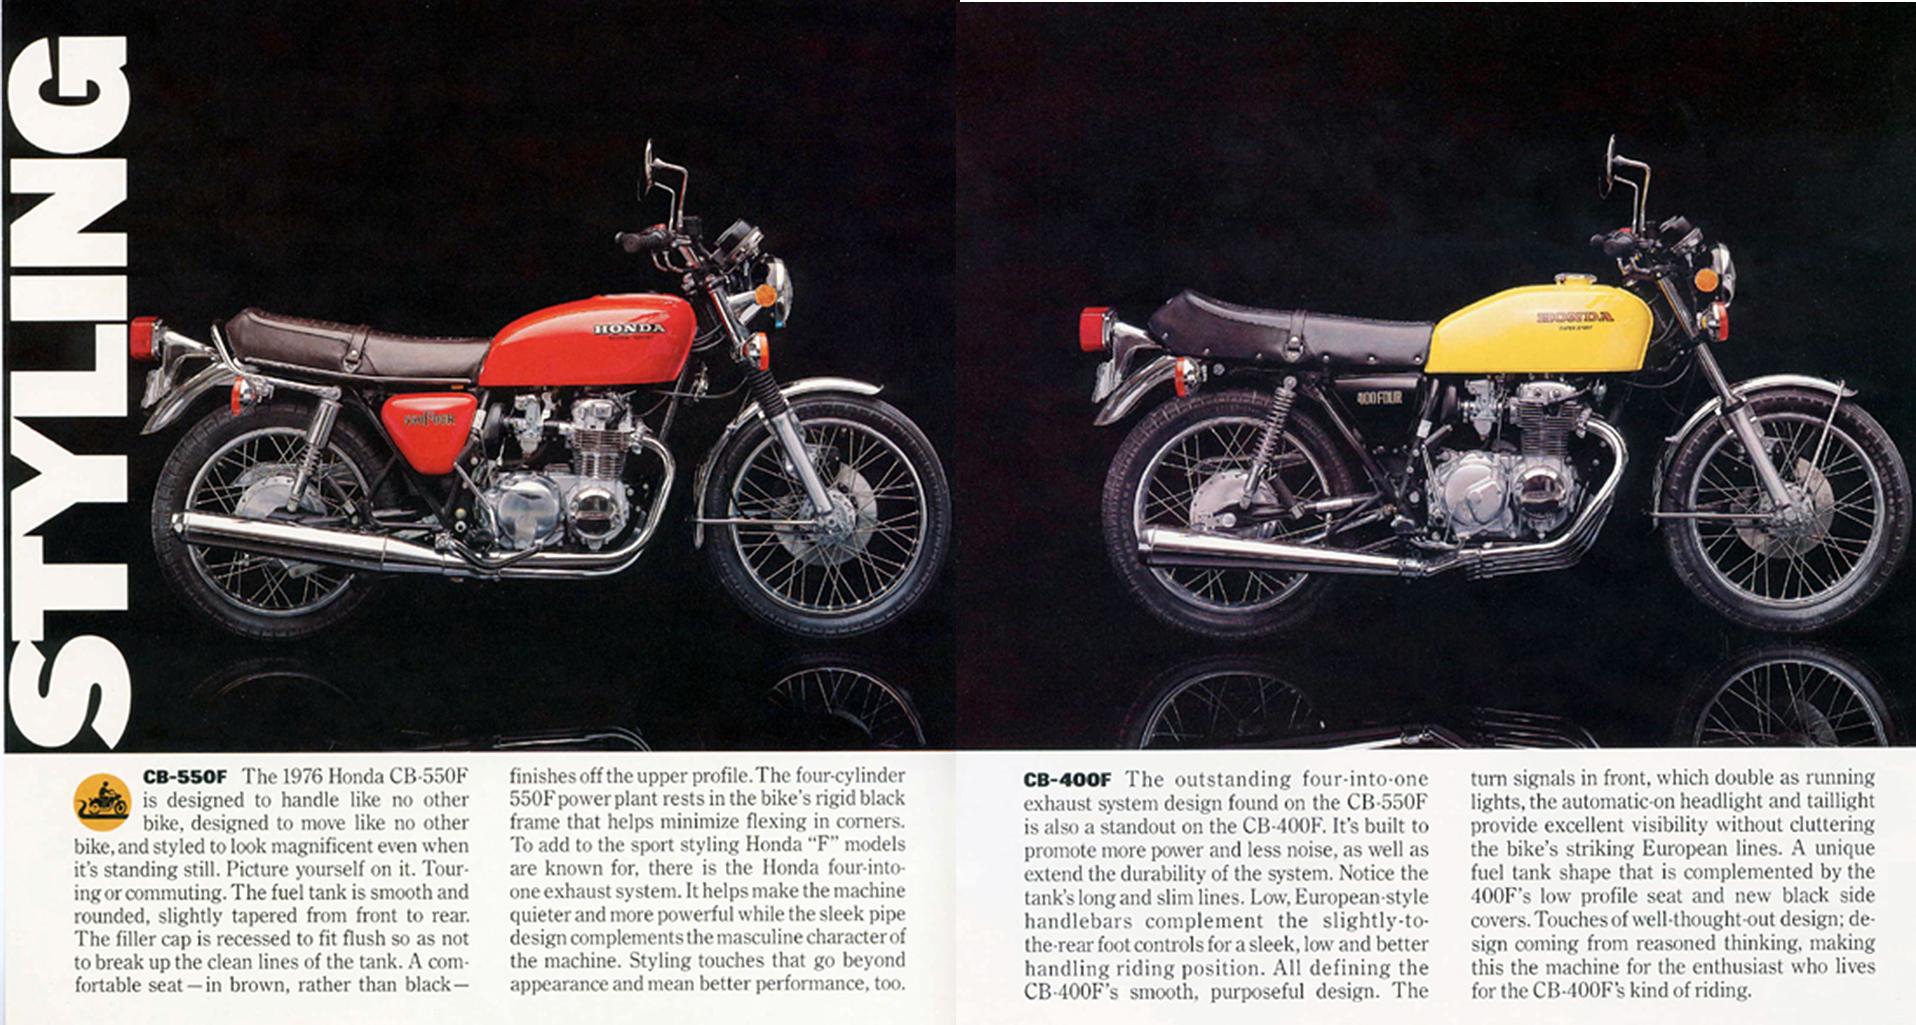 Honda Cb550f Cb400f Vintage Motorcycle Ad 2a